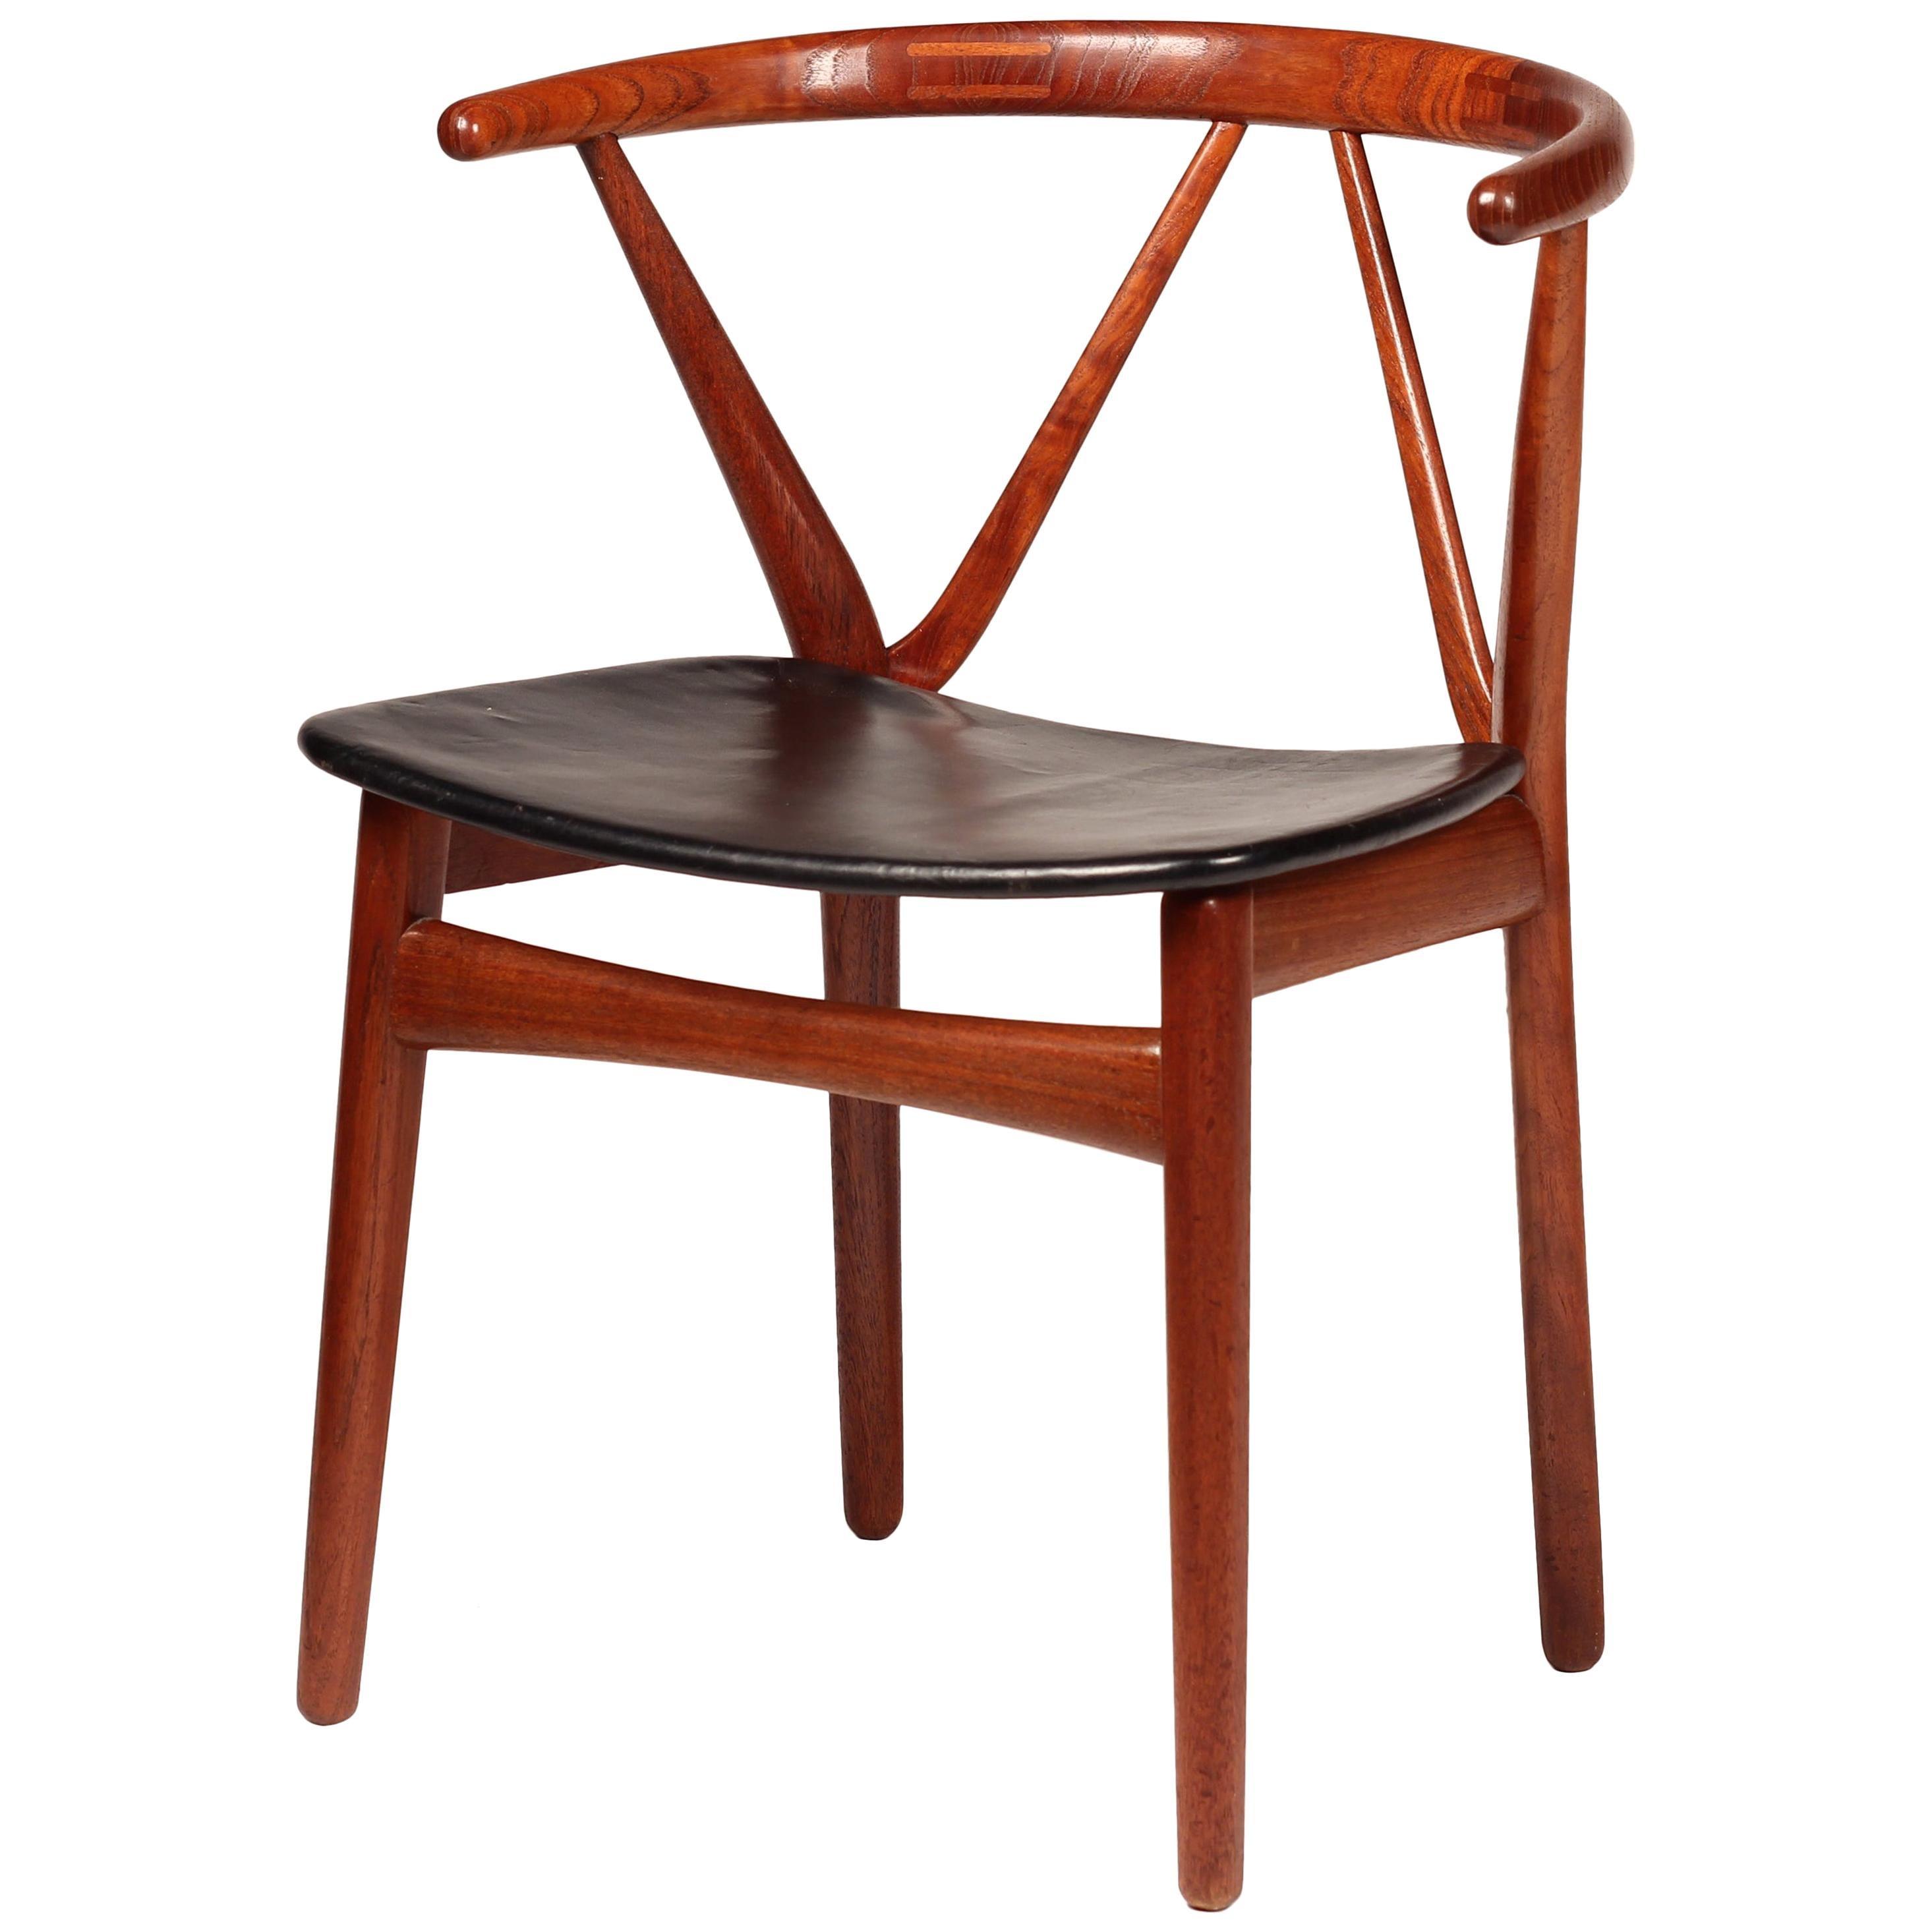 Mid-Century Modern Henning Kjærnulf Teak and Leather Dinning Chair Model 255